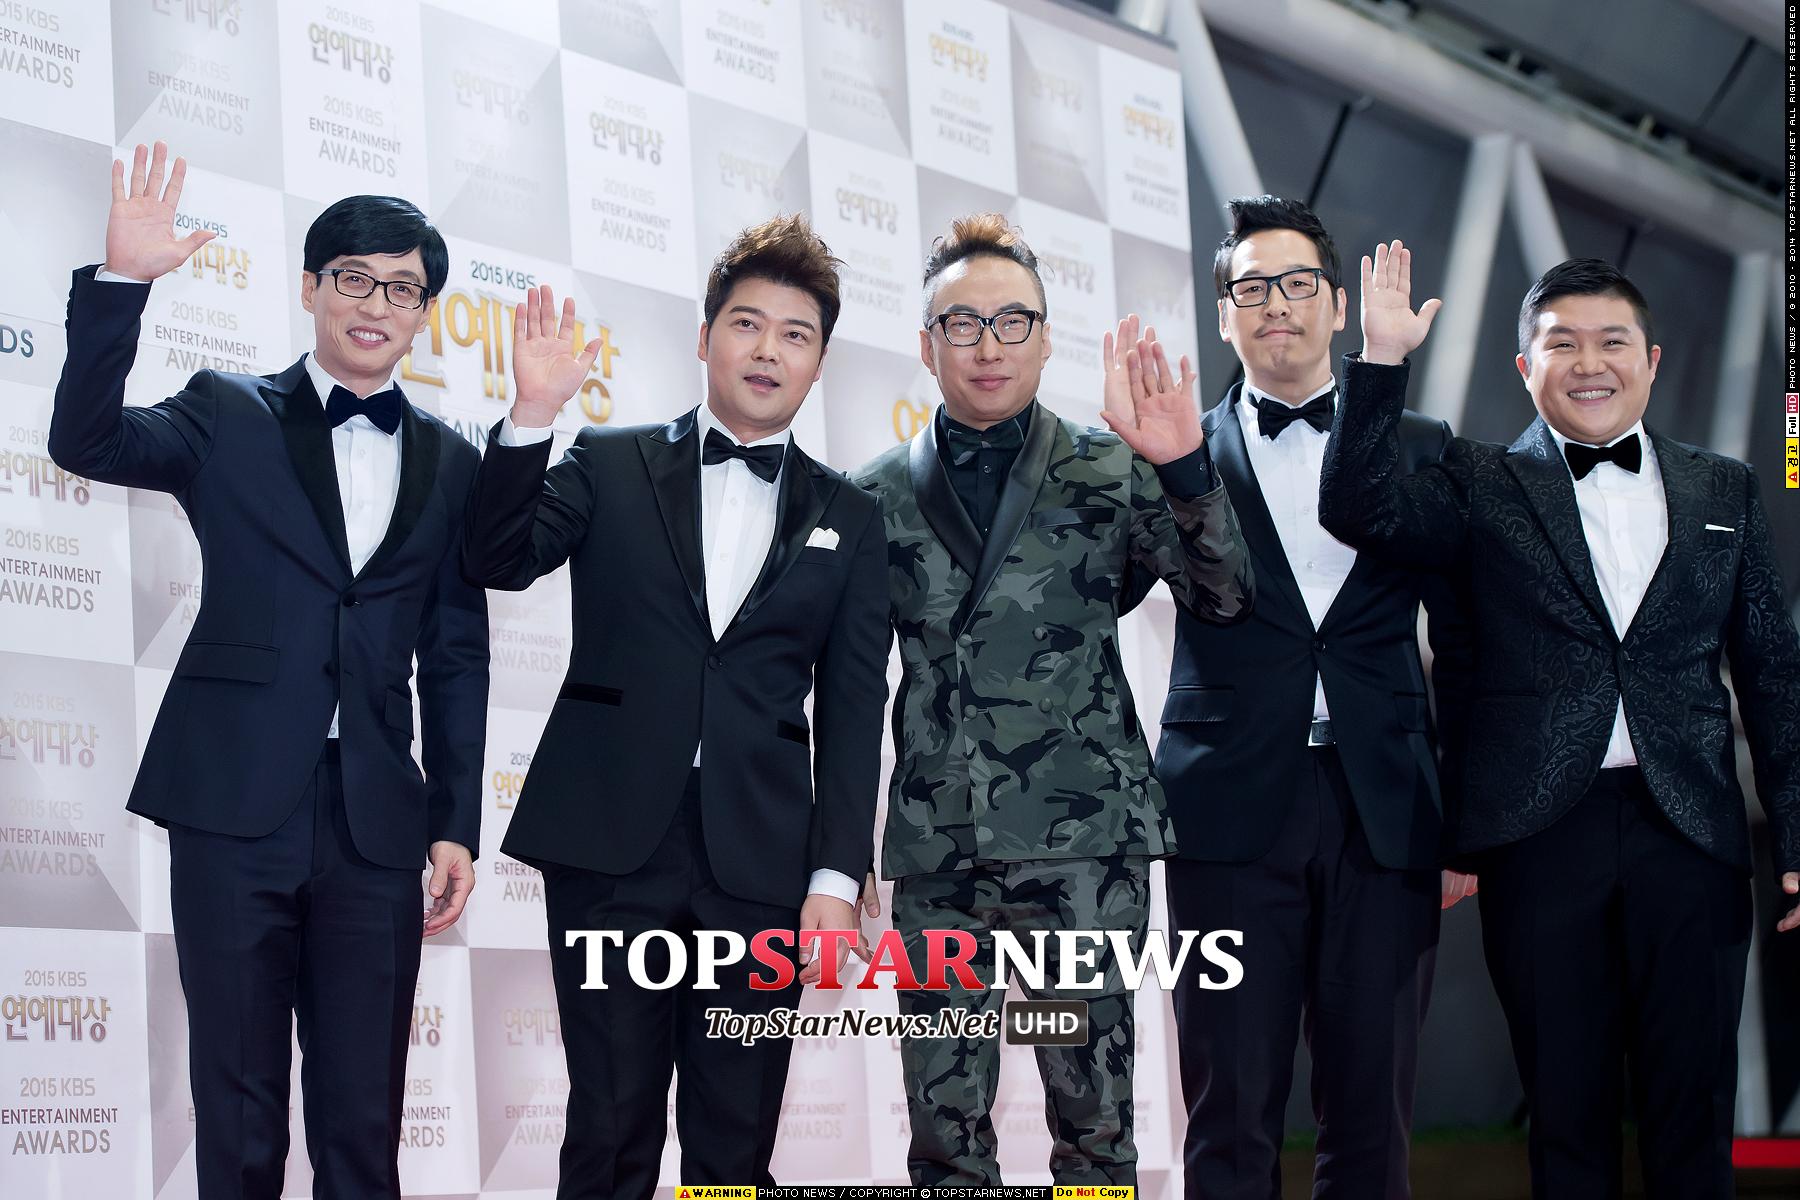 《Happy Together》的五位男主持人一同現身紅地毯 劉在石、全賢武、金風和曹世鎬都選擇最基本的黑白配 只有朴明秀一個人非常跳tone的穿了一套迷彩西裝